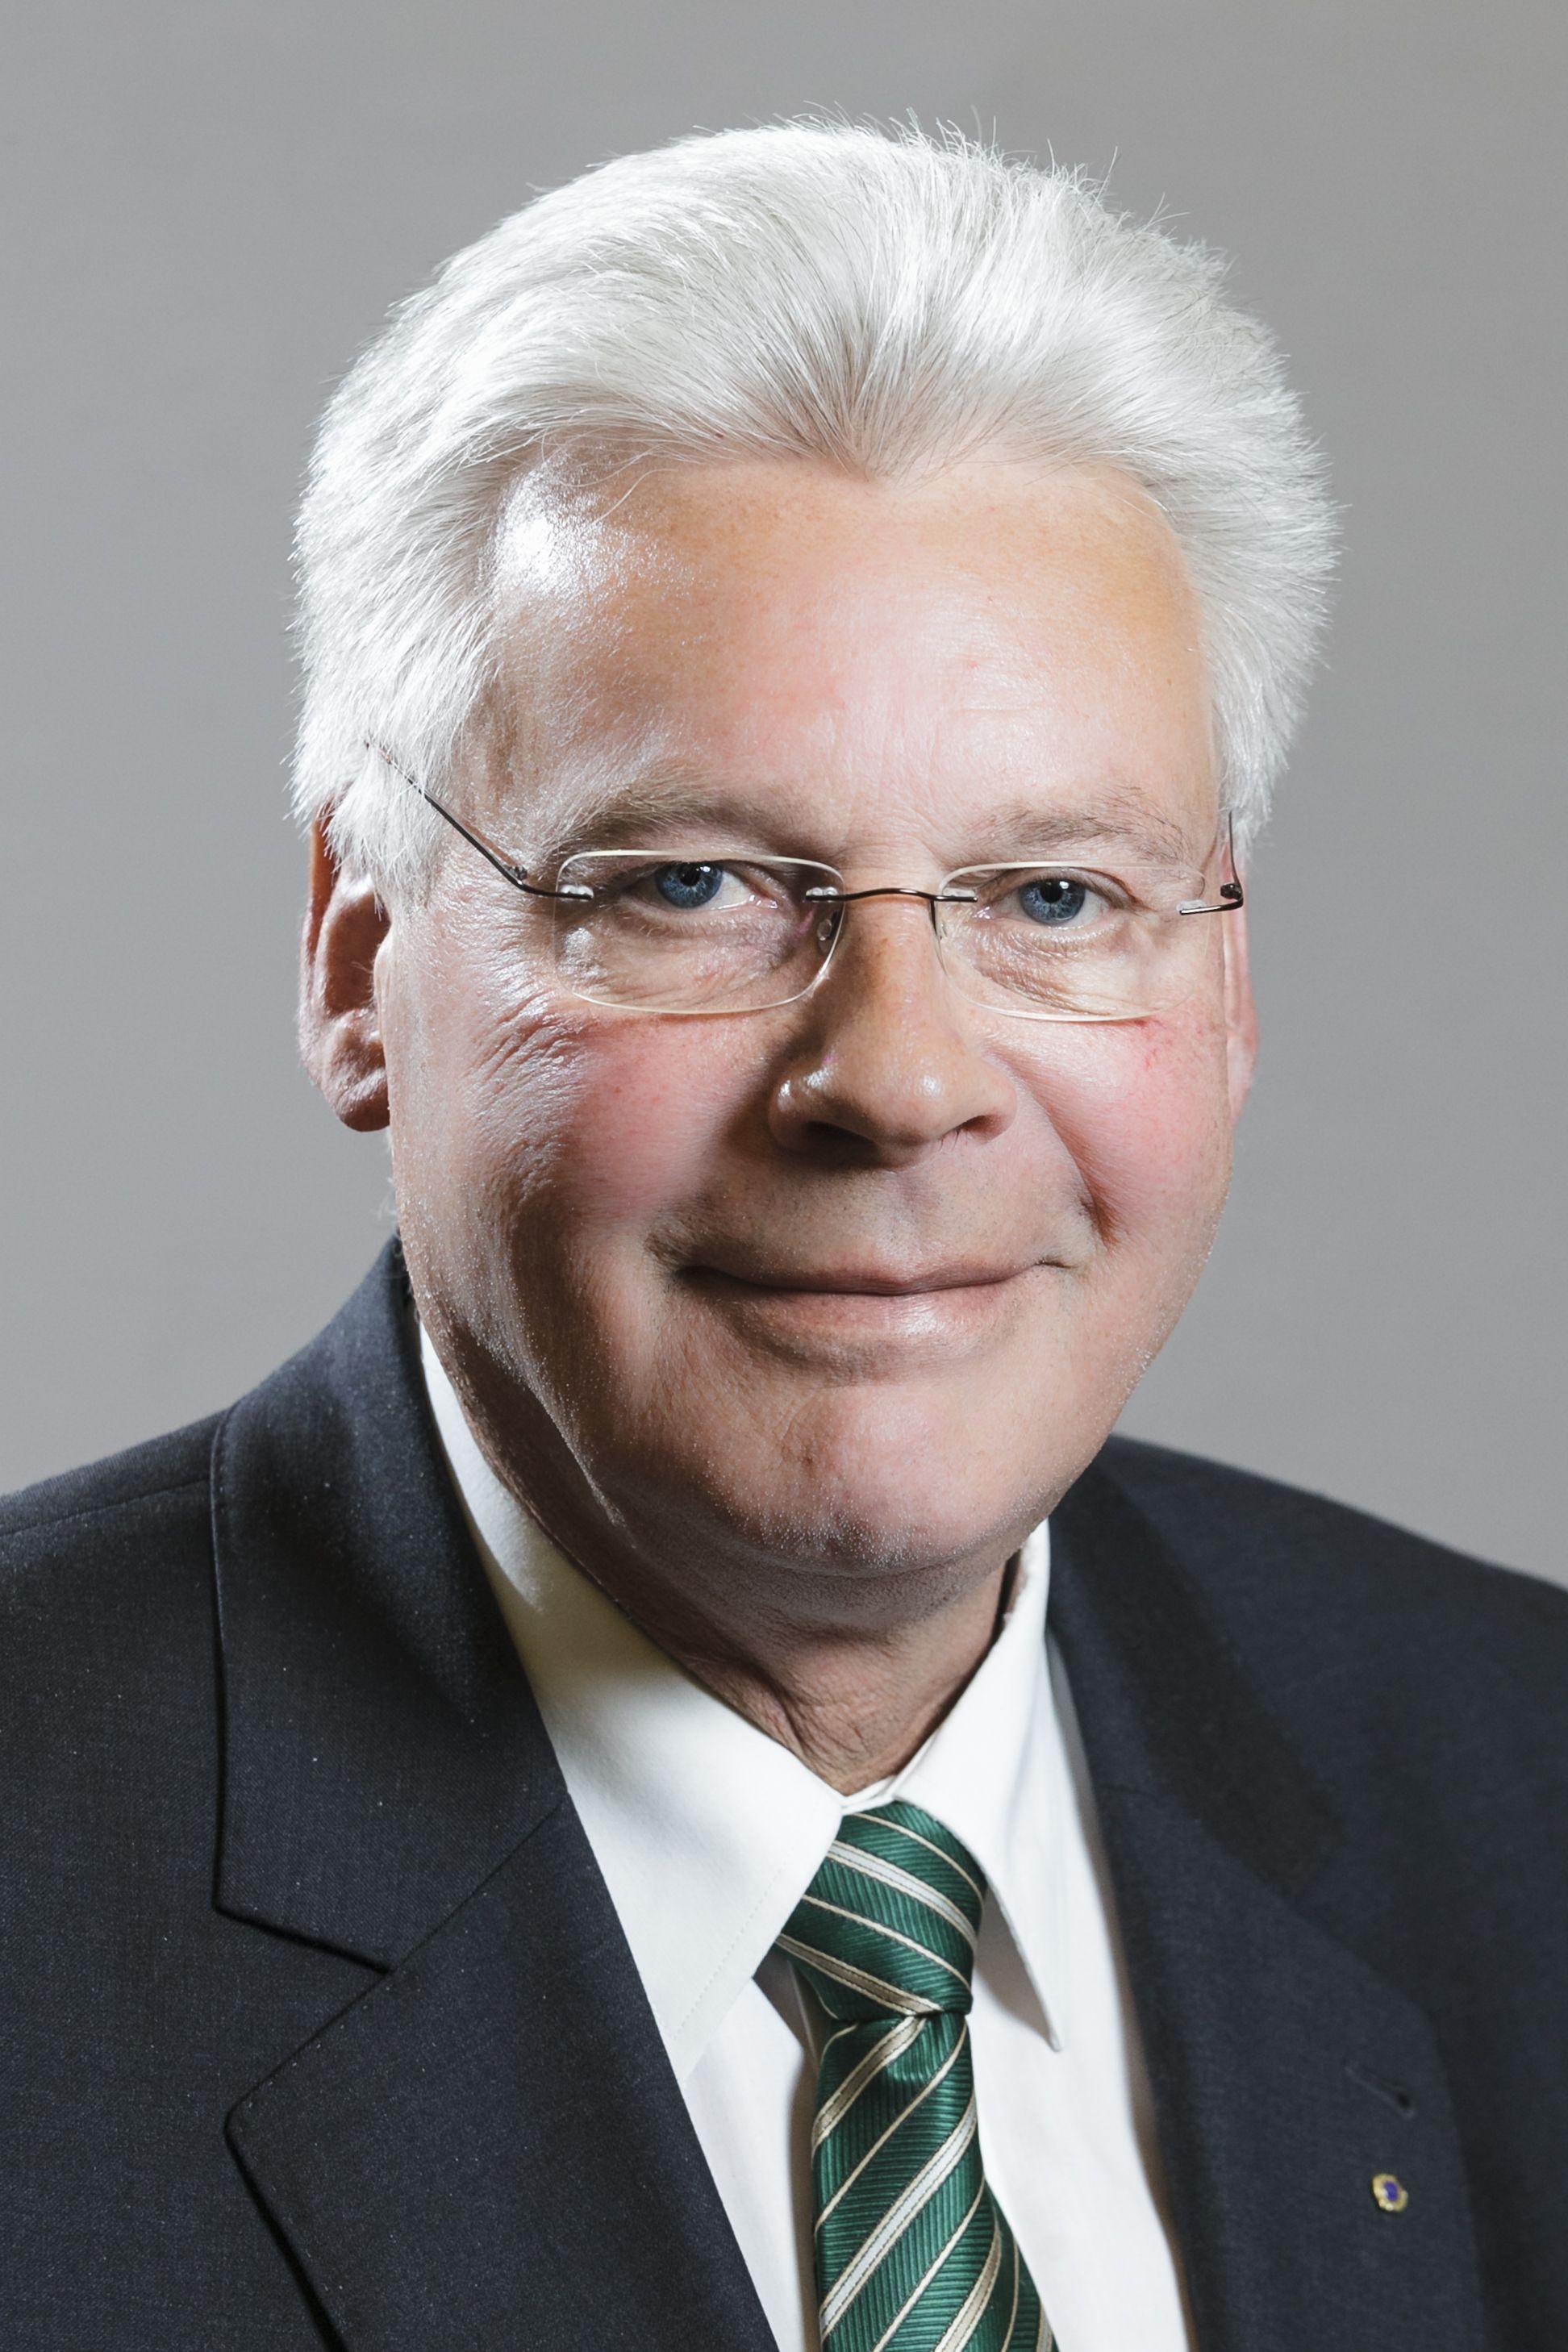 Porträt_Hans-Christian Biallas_Thomas Damm